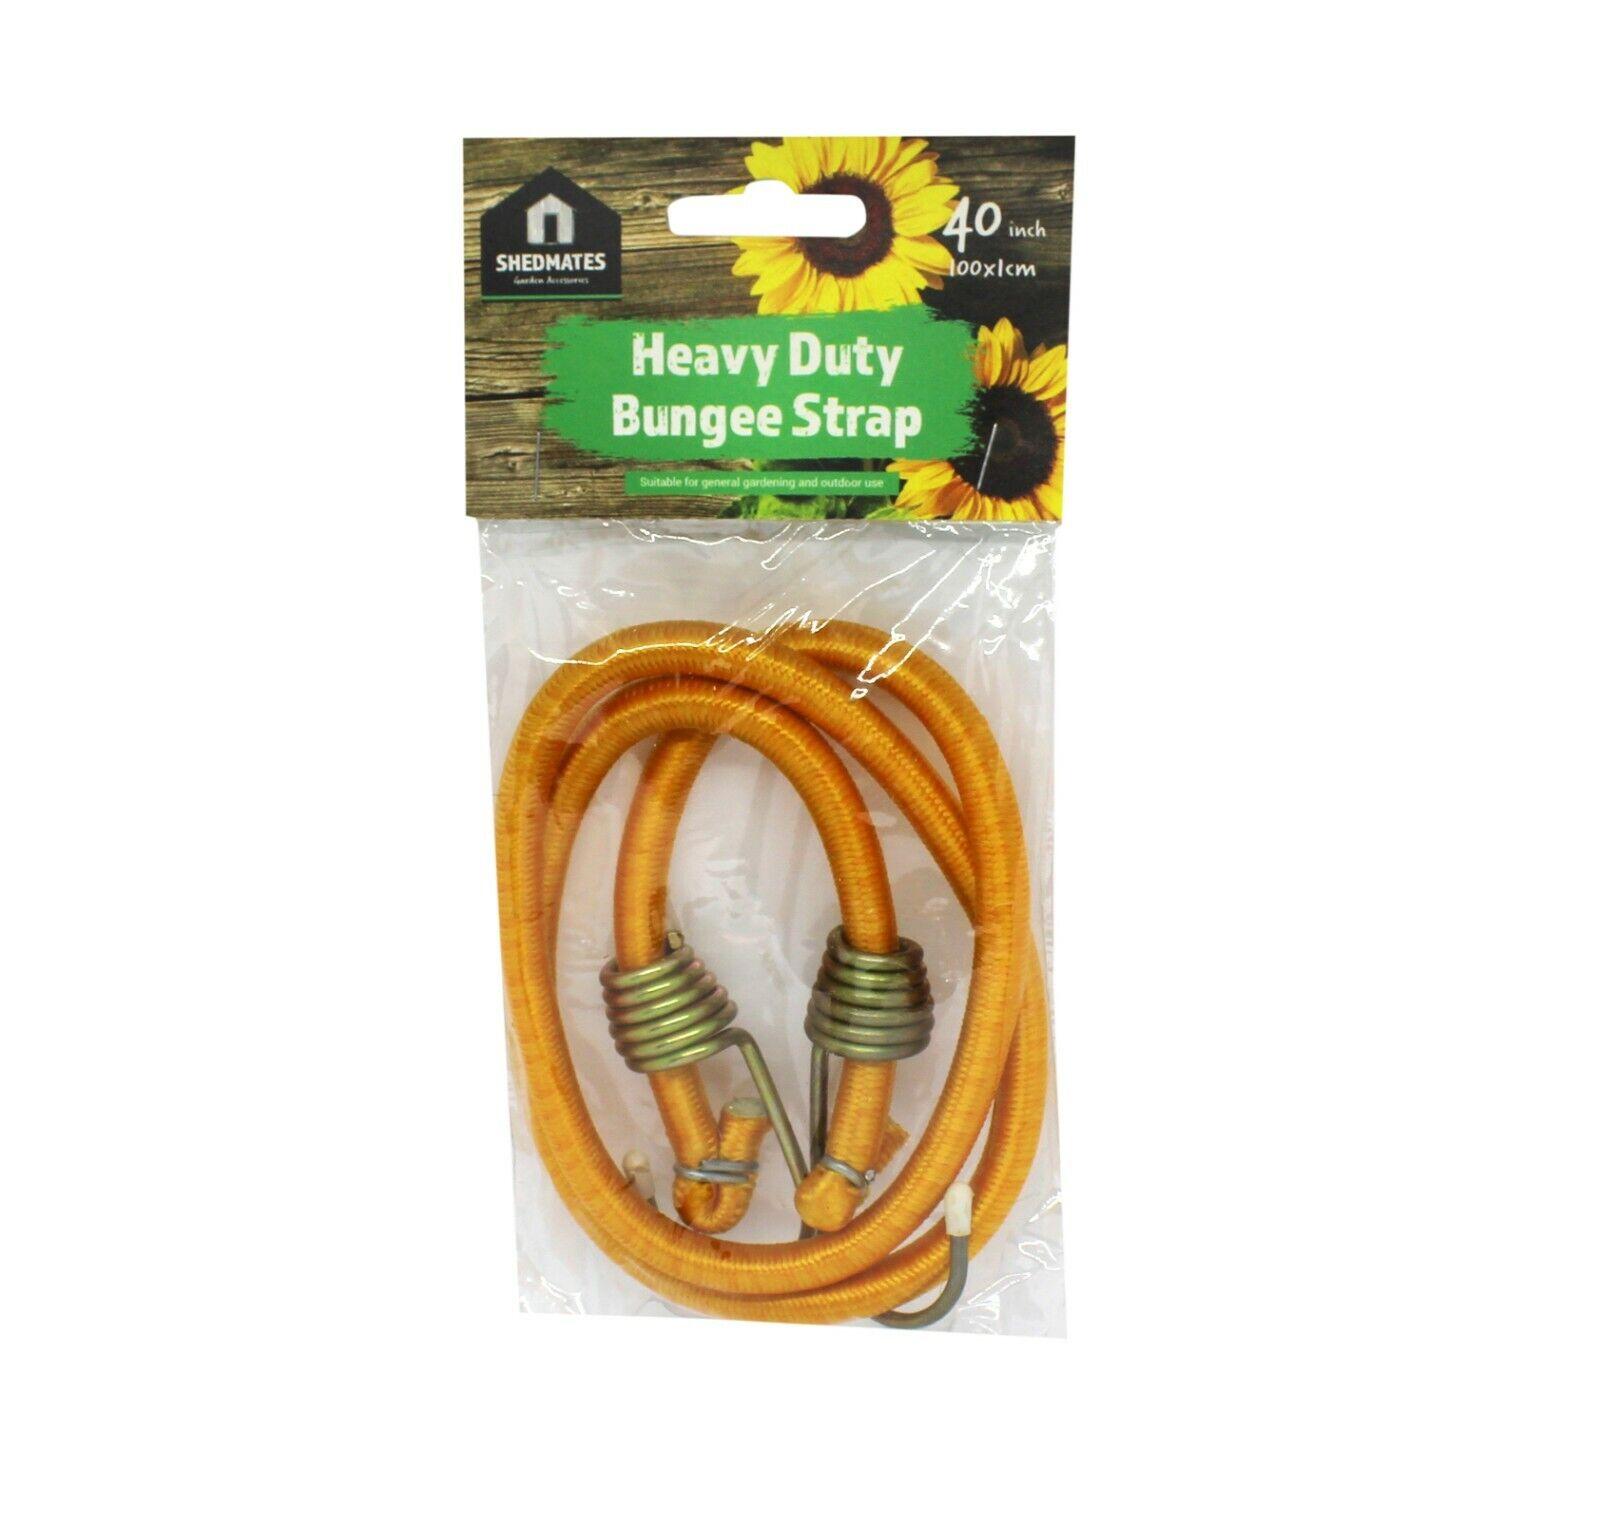 "2 Kingfisher 40/"" Heavy Duty Bungee sangle extensible cordon avec crochets 10 mm x 1016 mm"